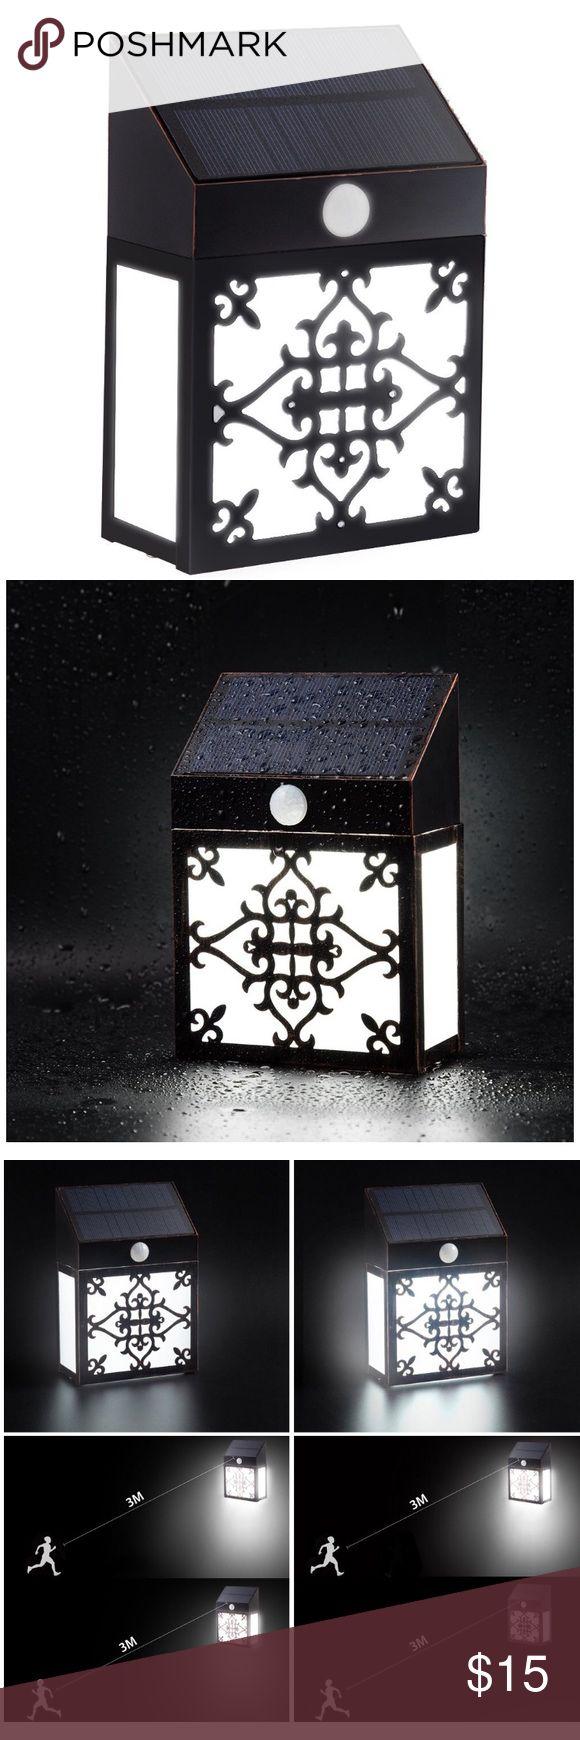 Cool Retro Solar Powered Motion Sensor Wall Lamp Light